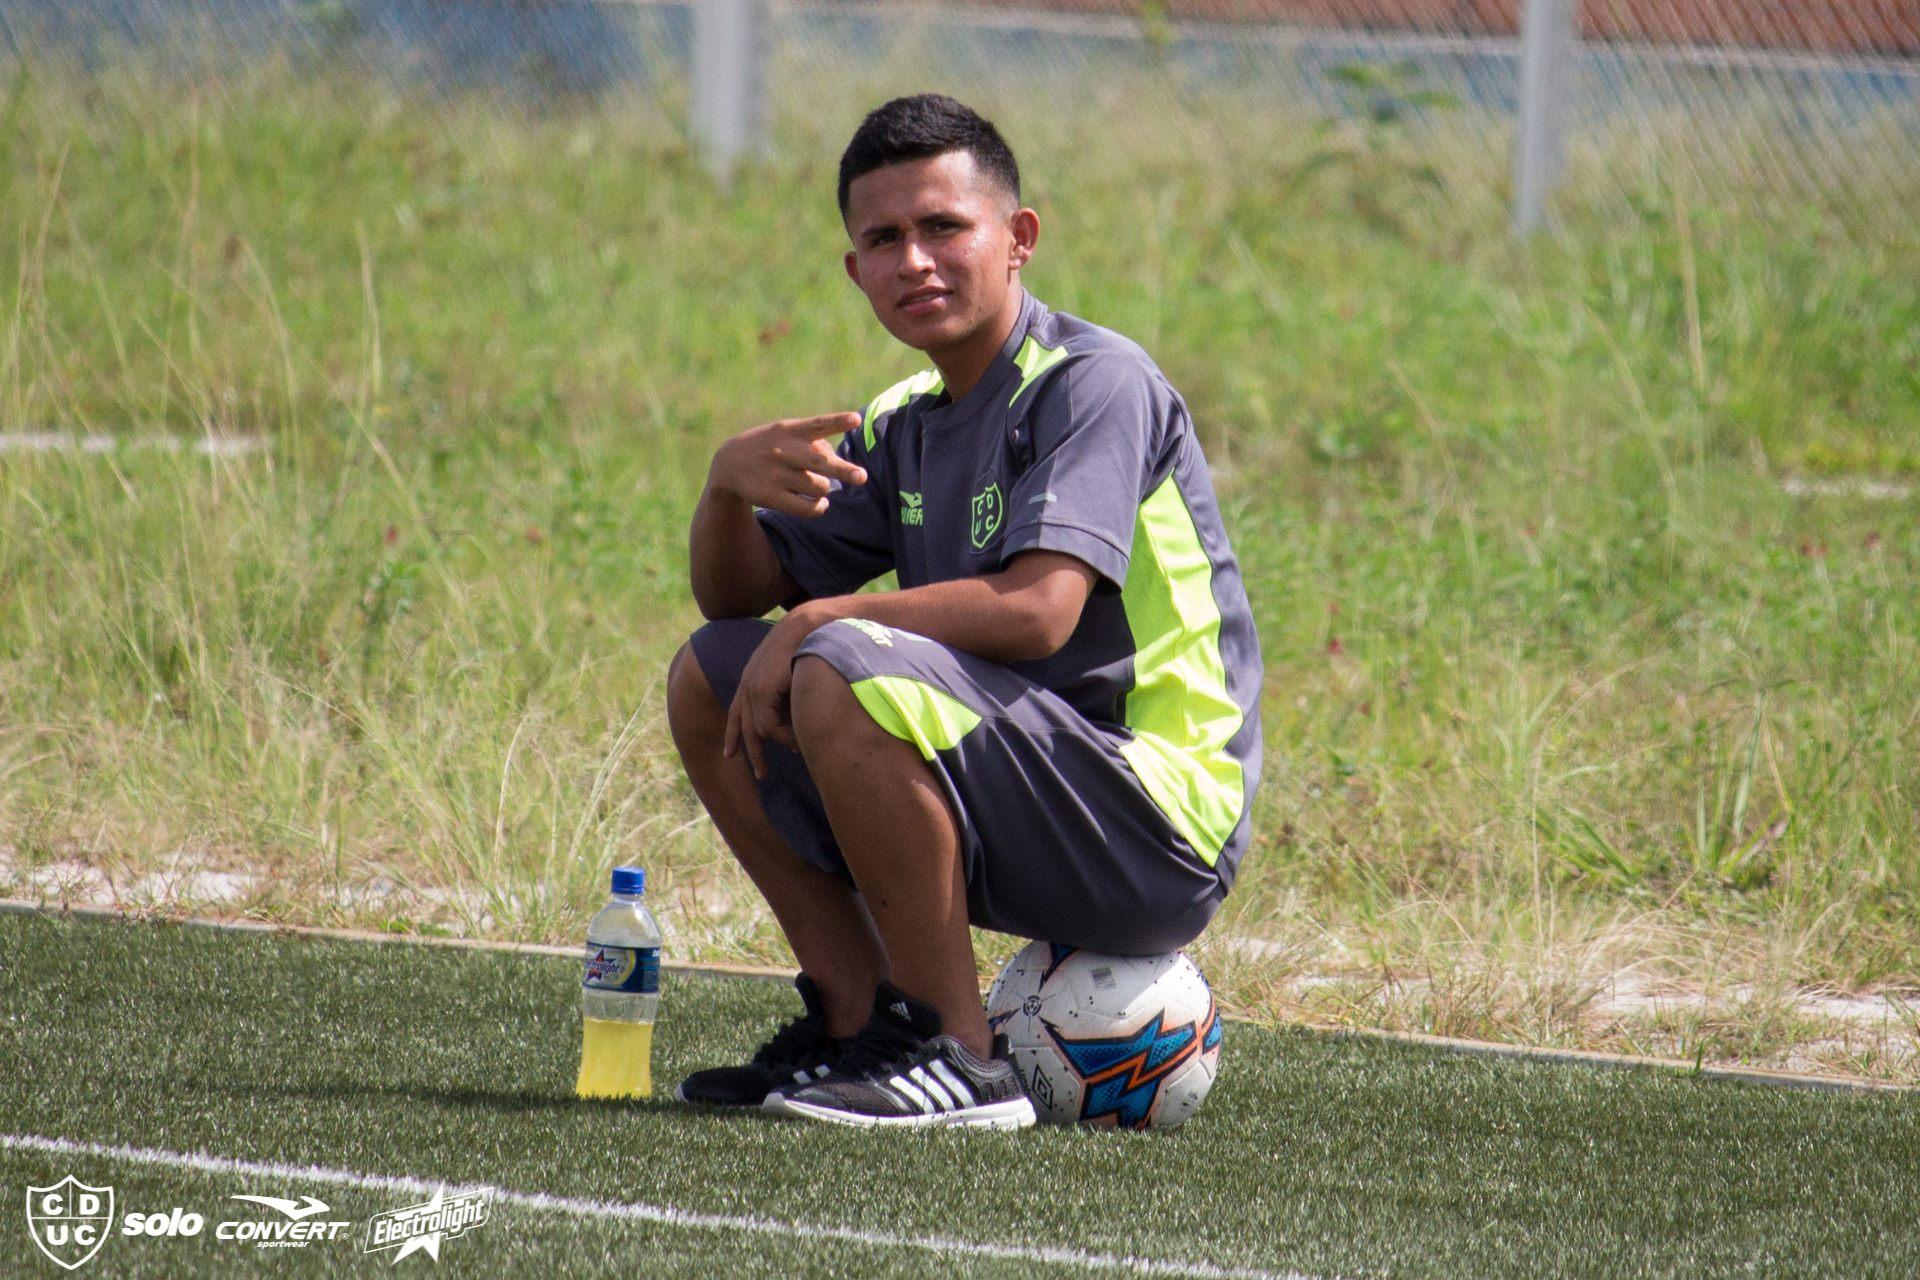 Osama Vinladen, Perú, Sub-15, Perú, futbolista, nombre, líder Al Qaeda